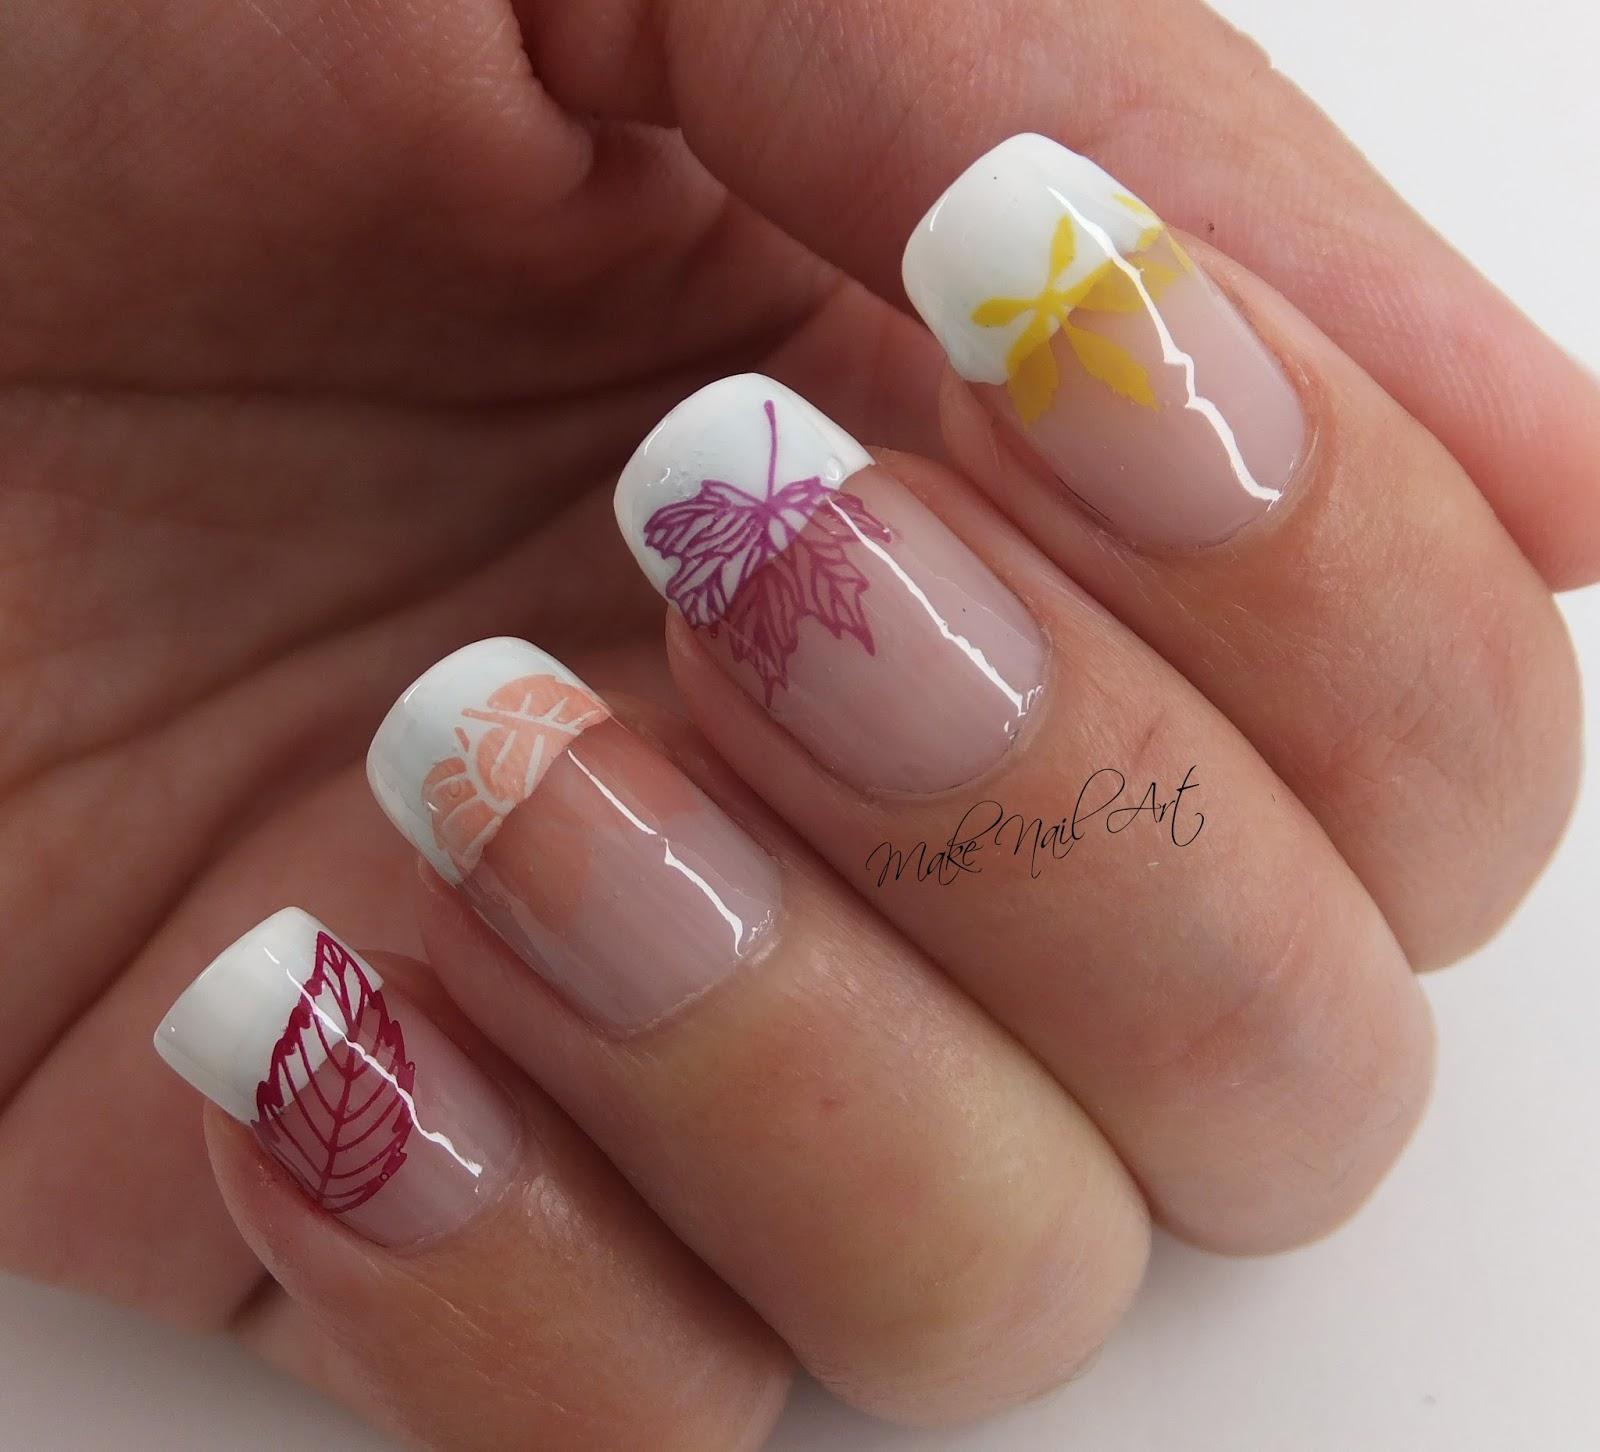 Make Nail Art: Autumn Stamping Leaves Nail Art Design Tutorial